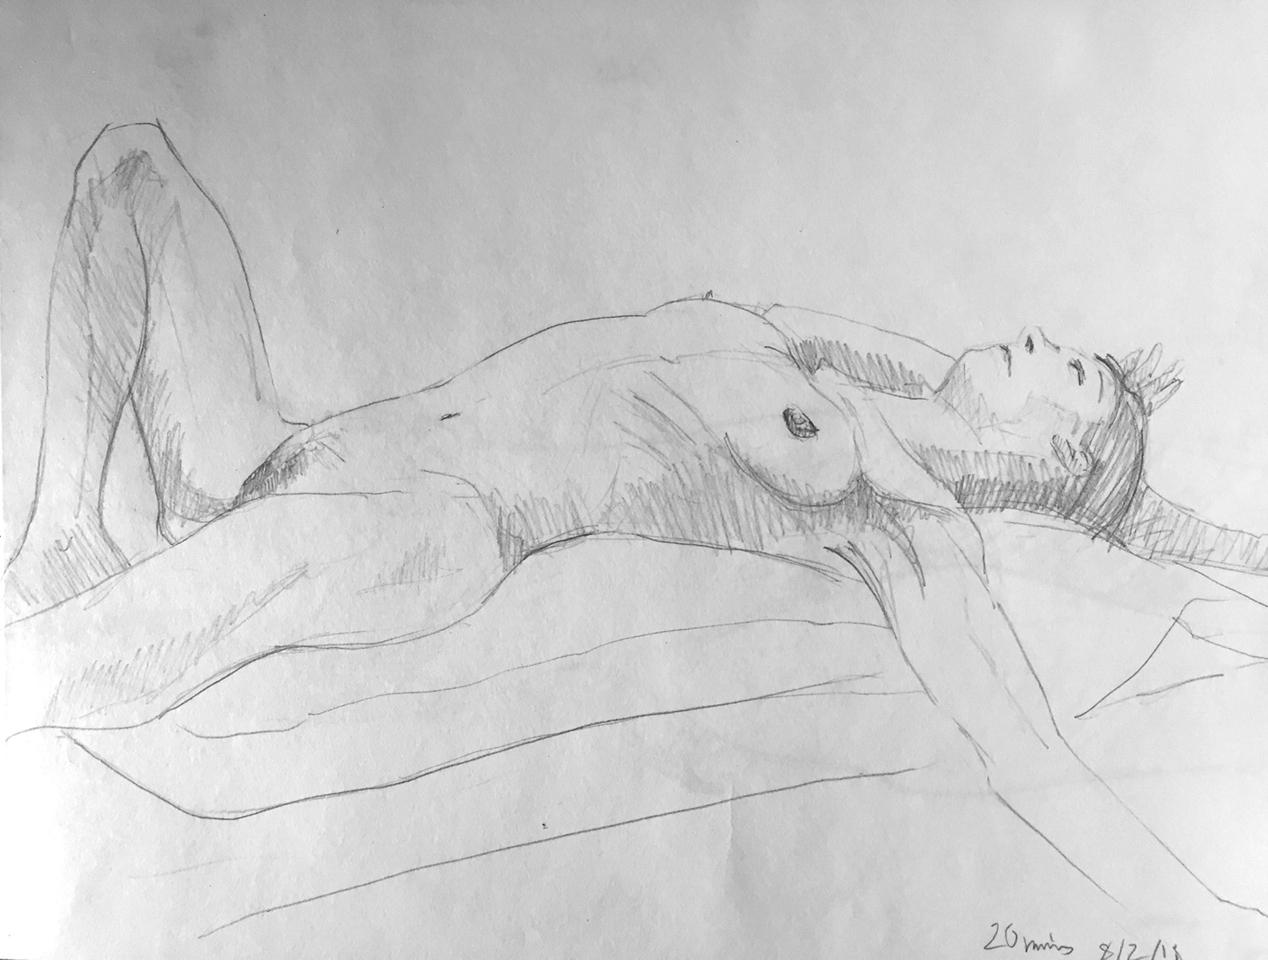 Life Drawing Sketch 8/2/18